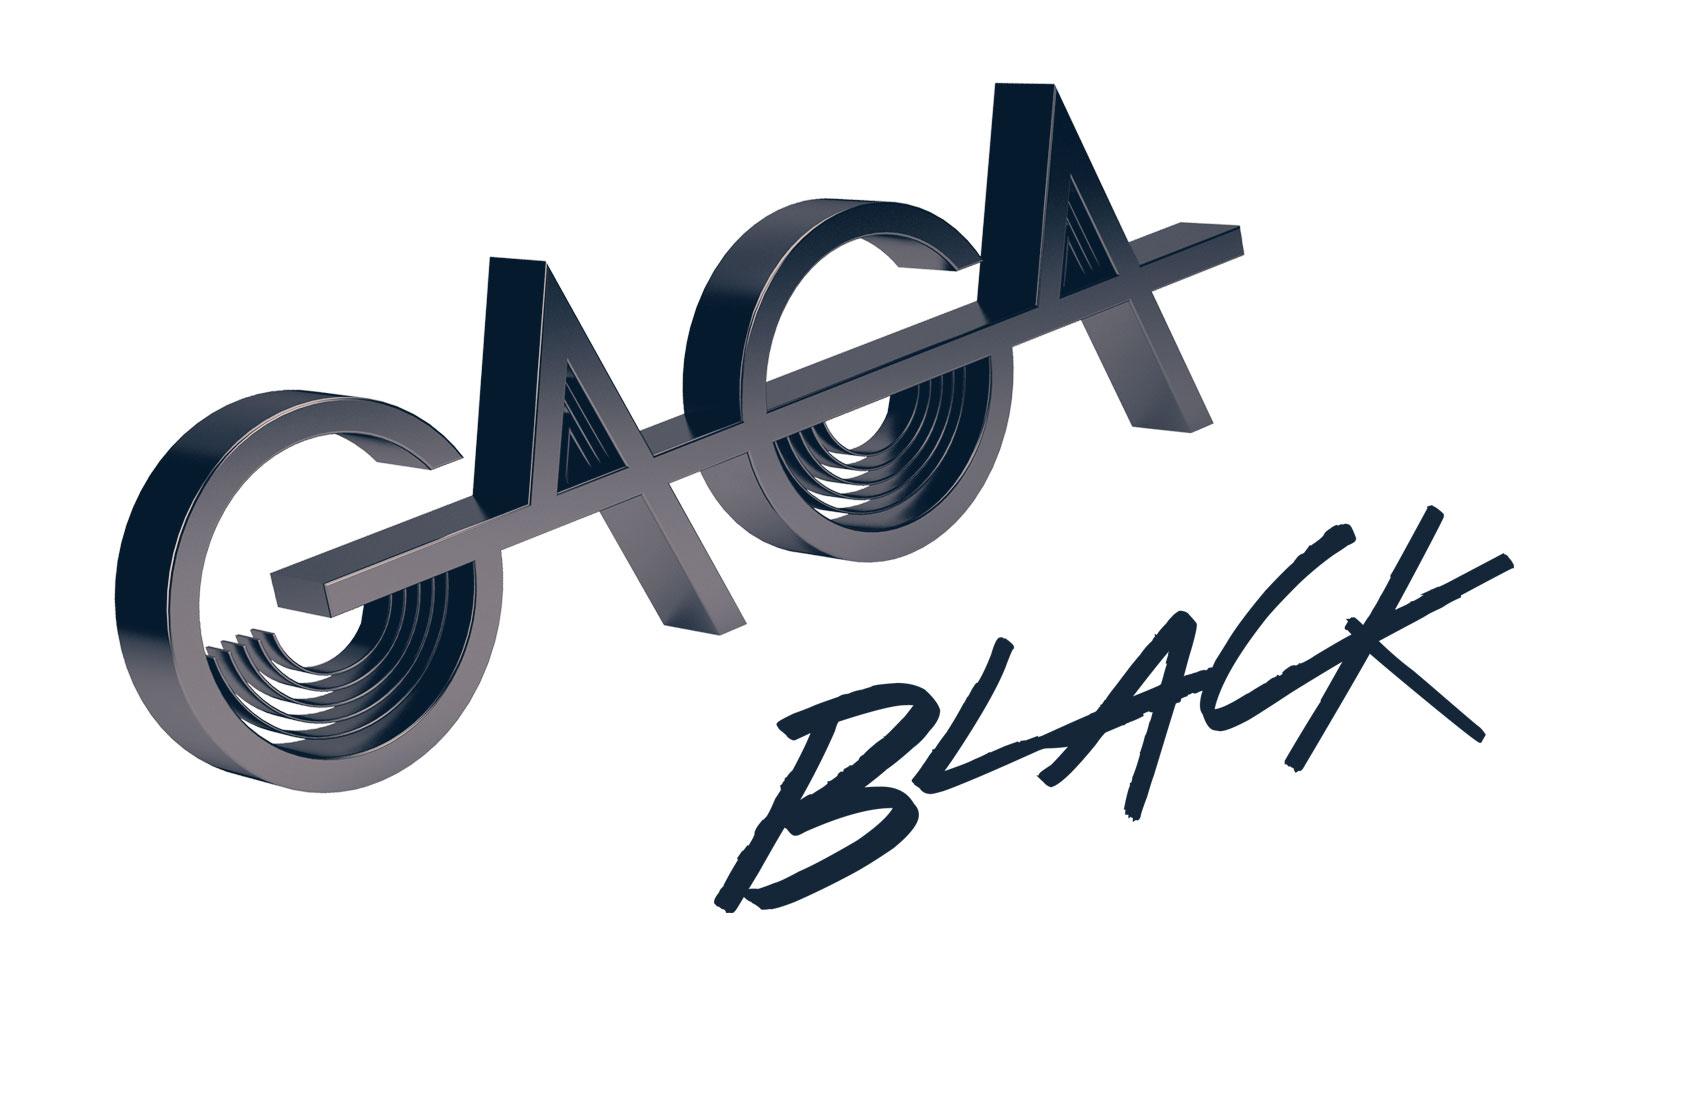 gaga_3_cgi_jorge_gago_3d